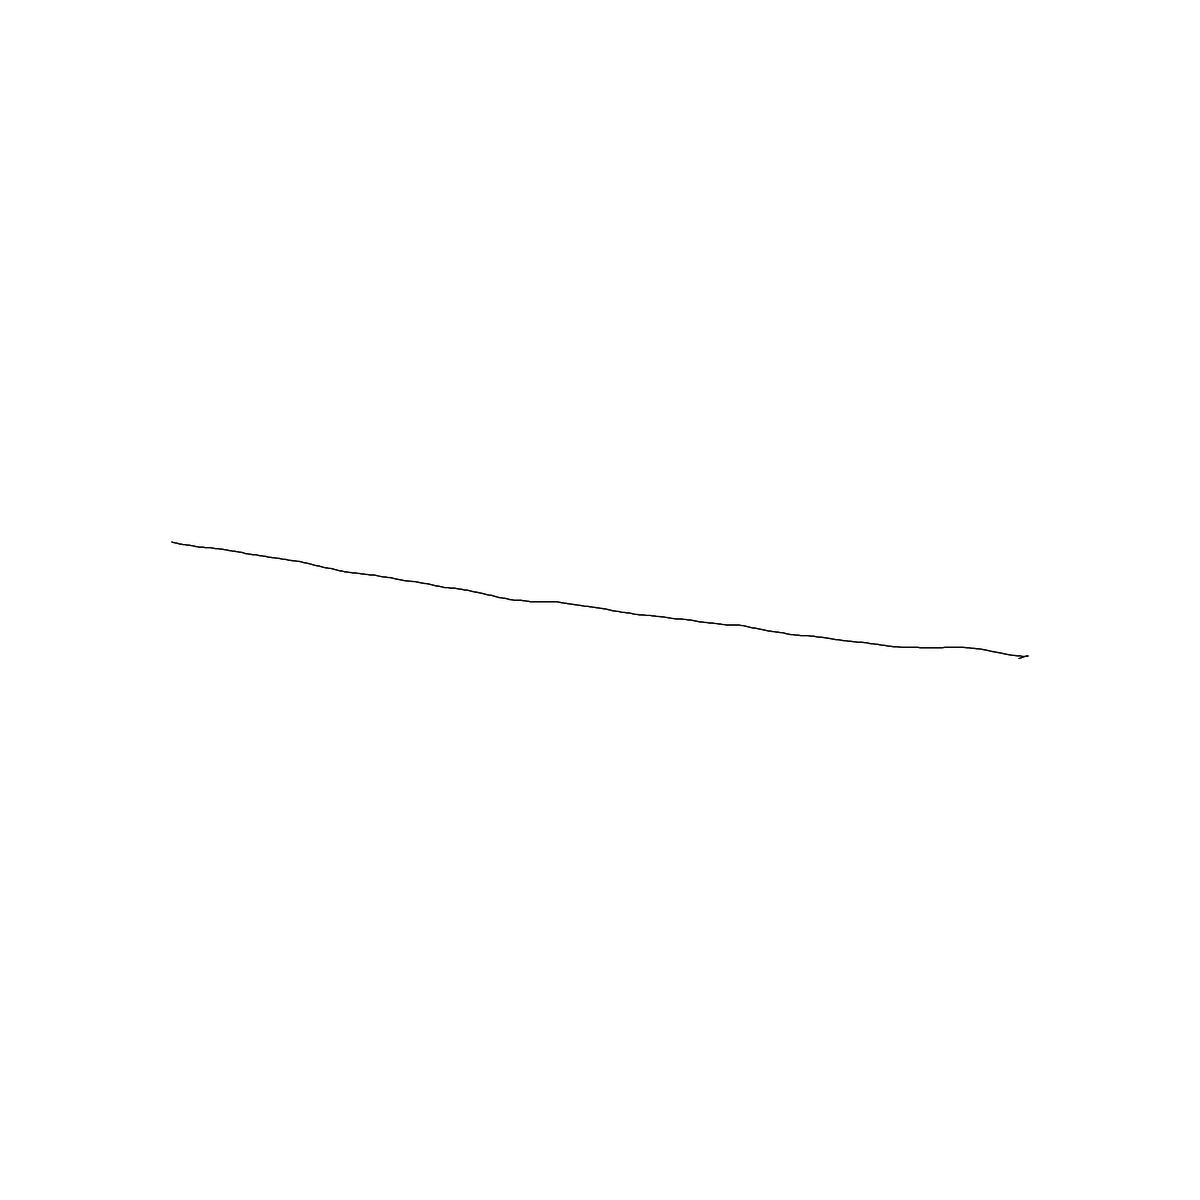 BAAAM drawing#23136 lat:35.7410469055175800lng: 51.3824844360351560